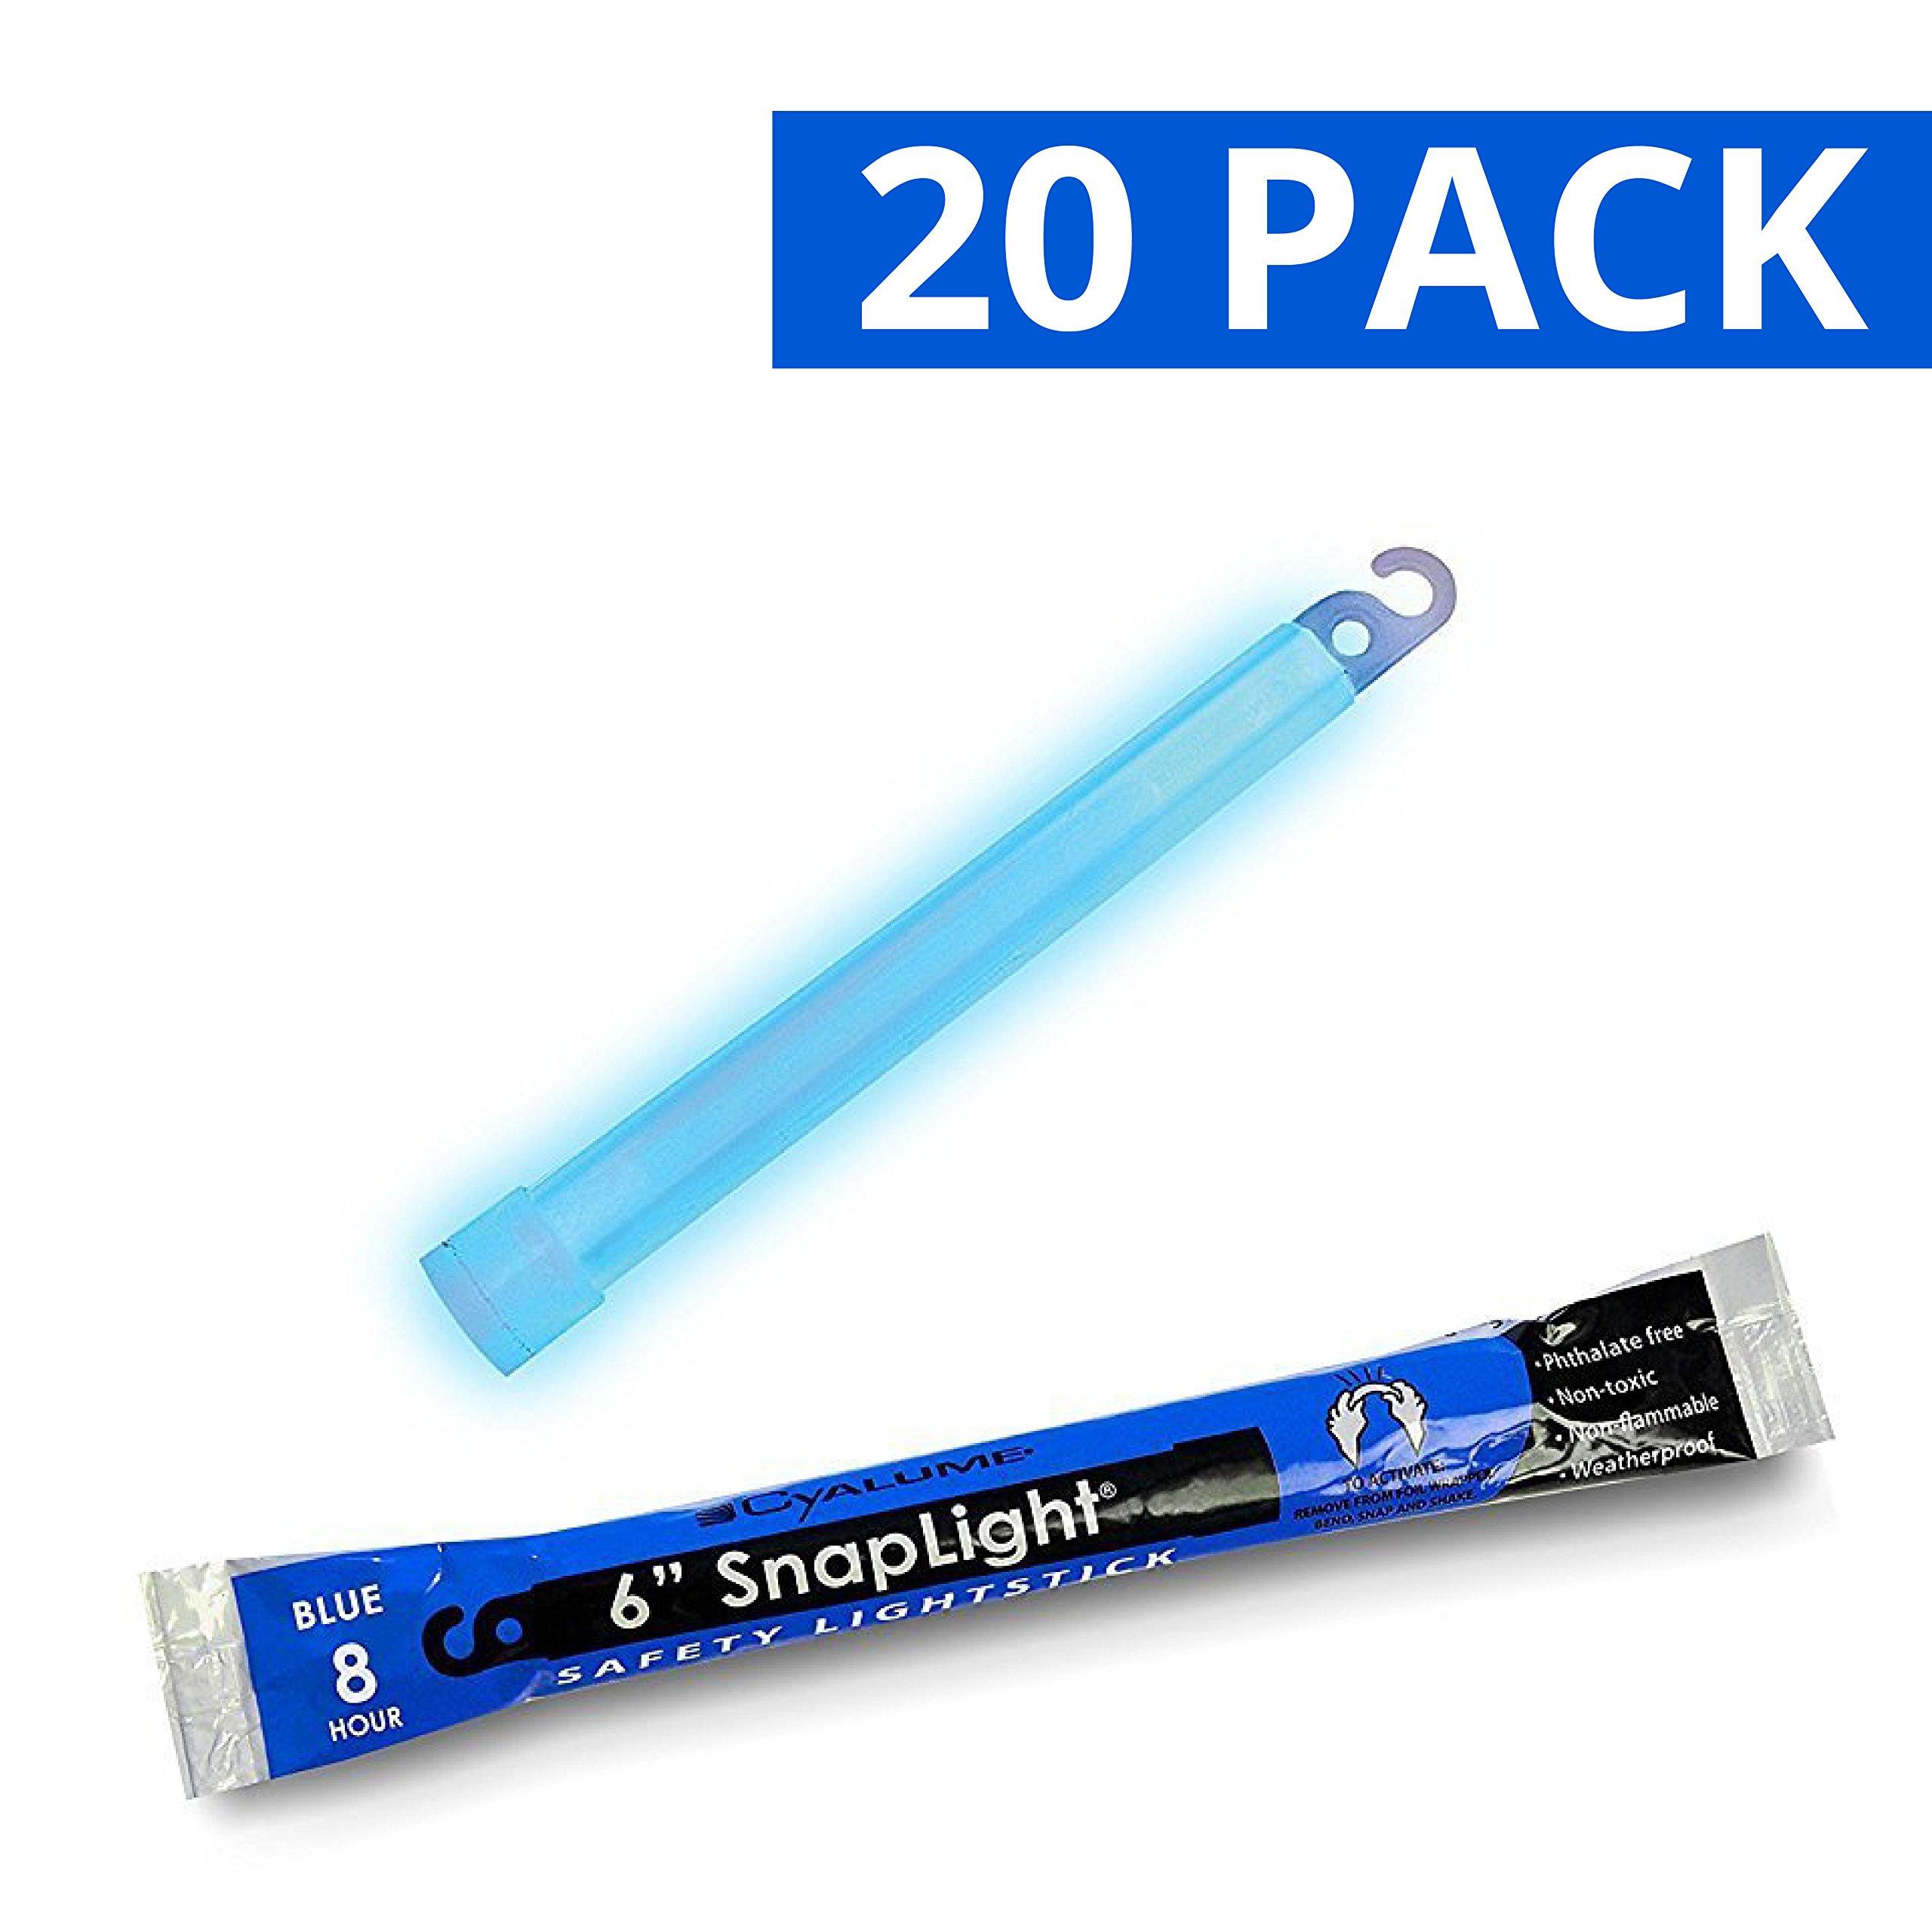 Cyalume SnapLight Blue Light Sticks - 6 Inch Industrial Grade, High Intensity Glow Sticks with 8 Hour Duration (Pack of 20)